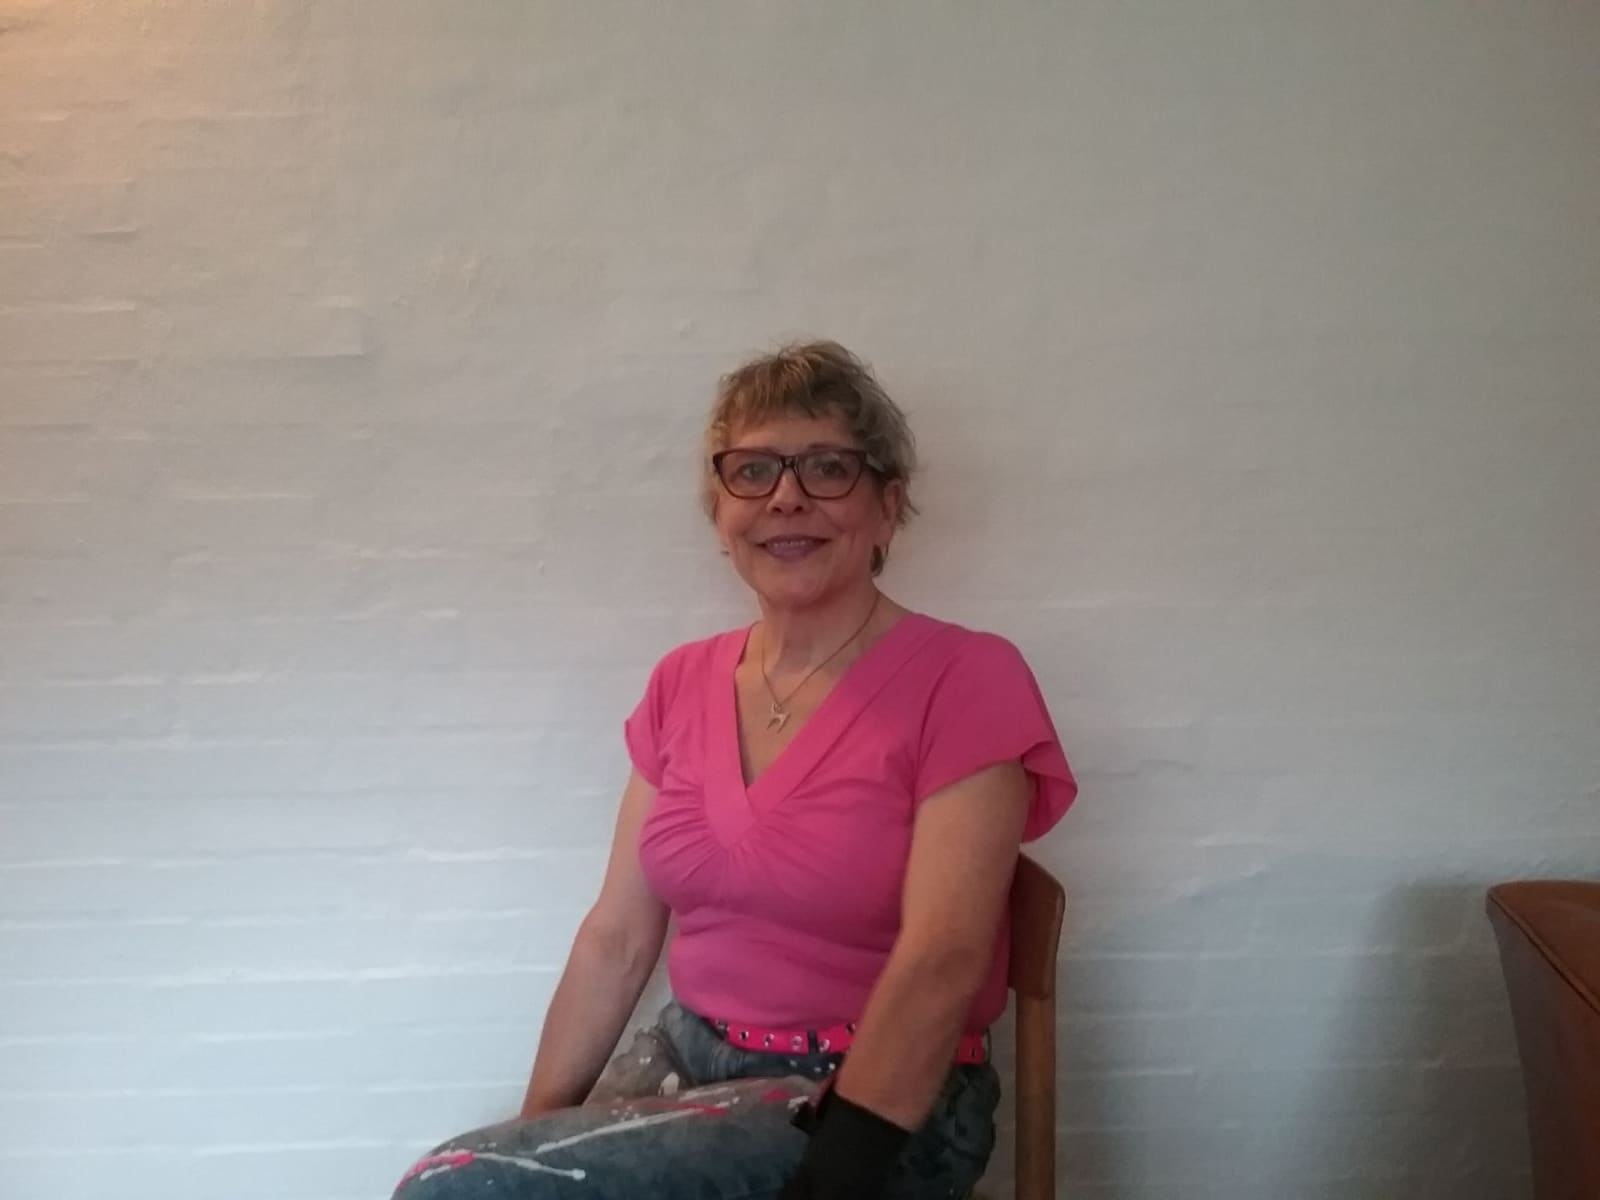 Kathryn cargill from Esbjerg, Denmark